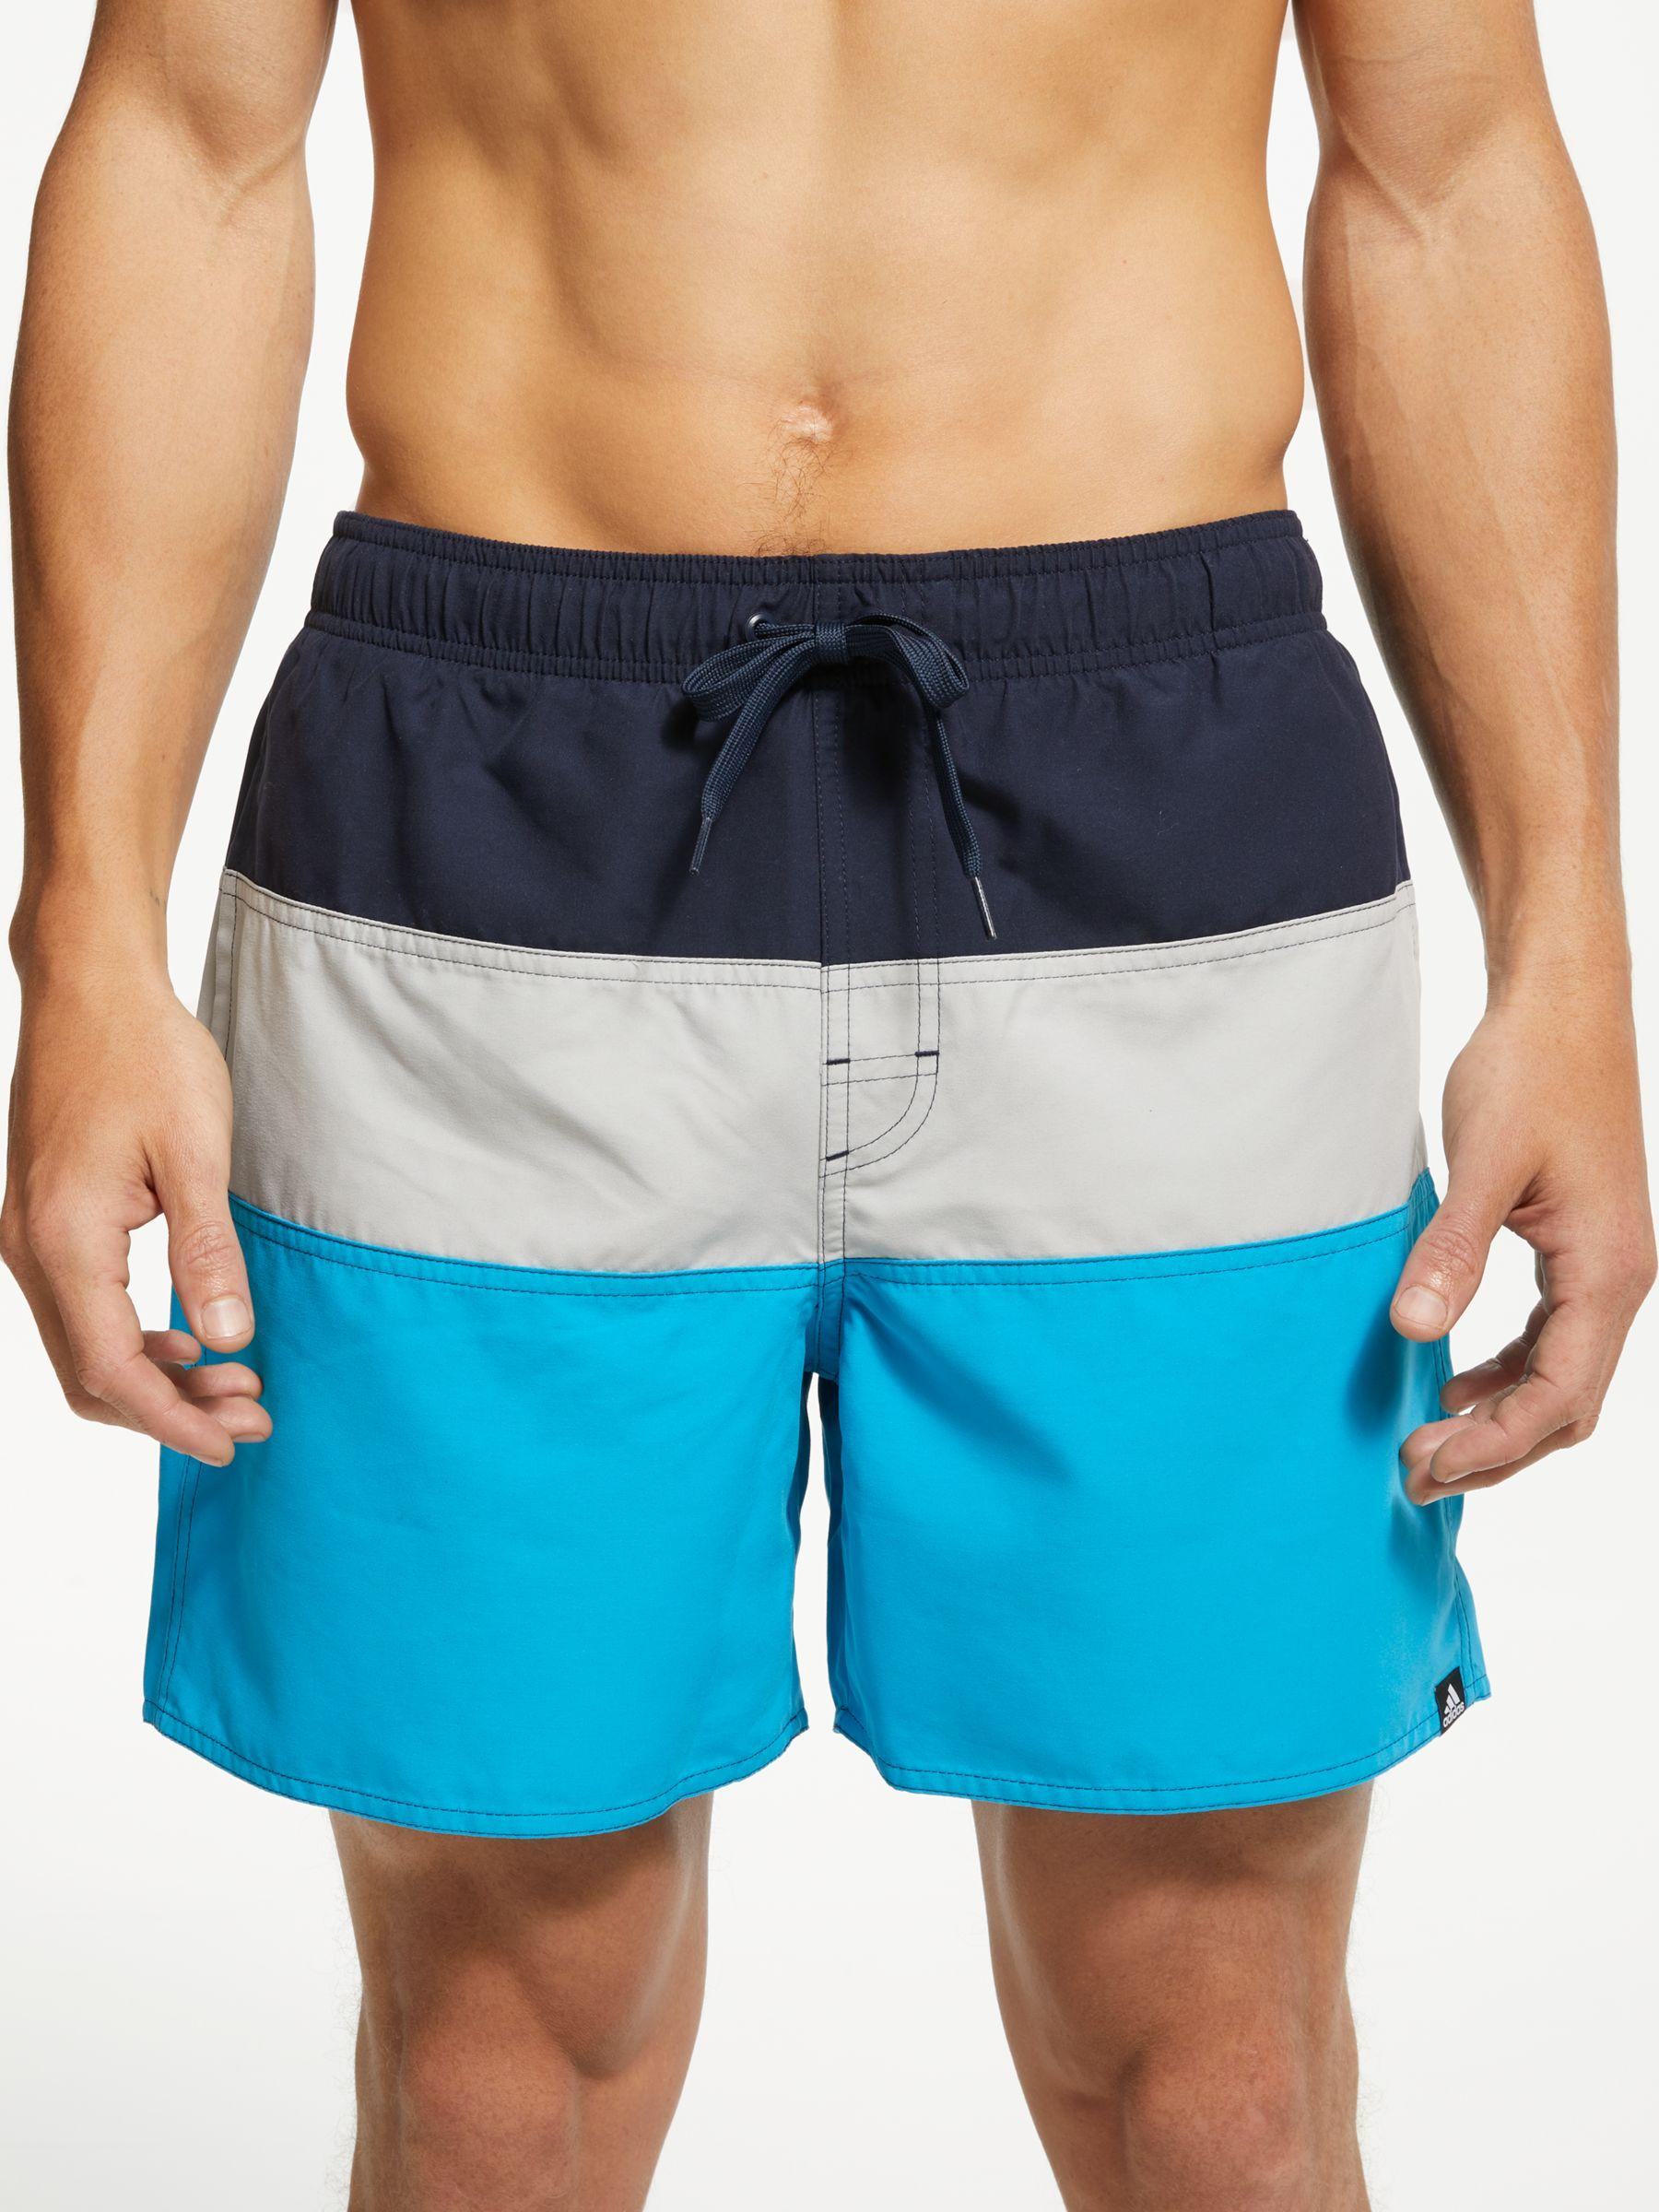 1bfad05f4d adidas Colour Block Swim Shorts in Blue for Men - Lyst